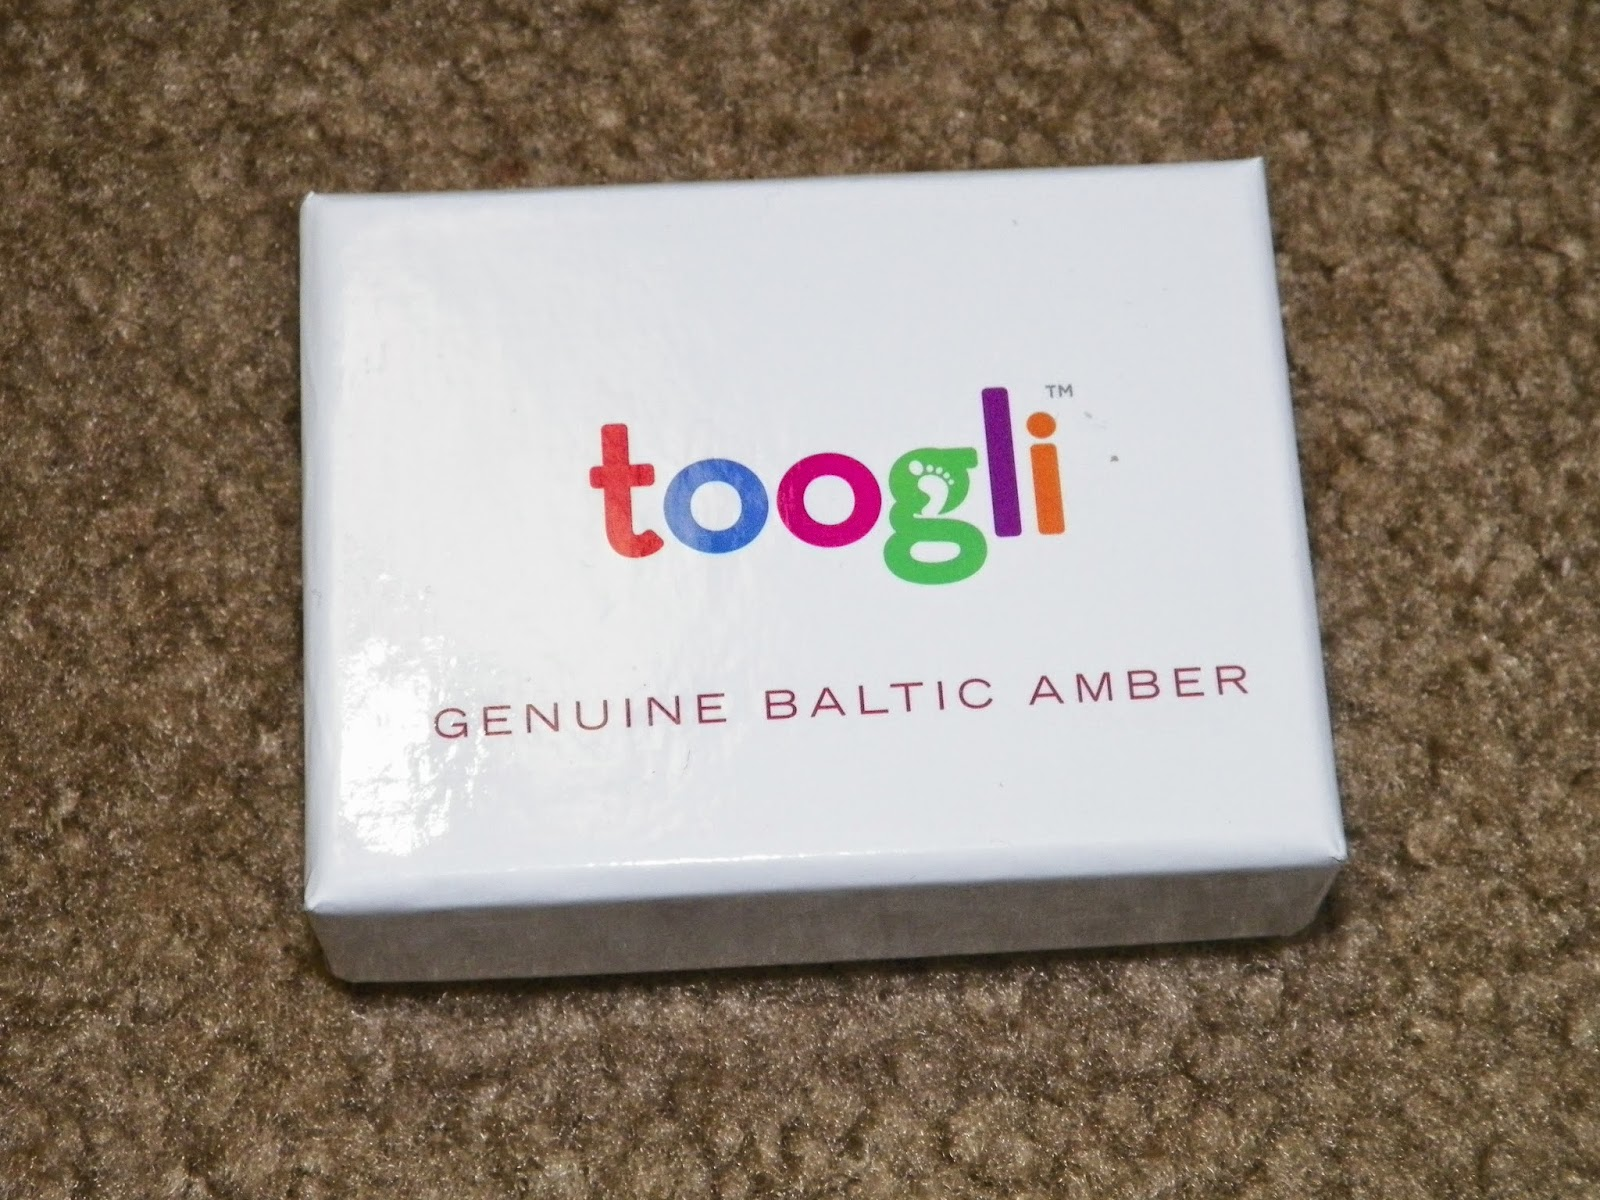 ToogliGenuineBalticAmber.jpg